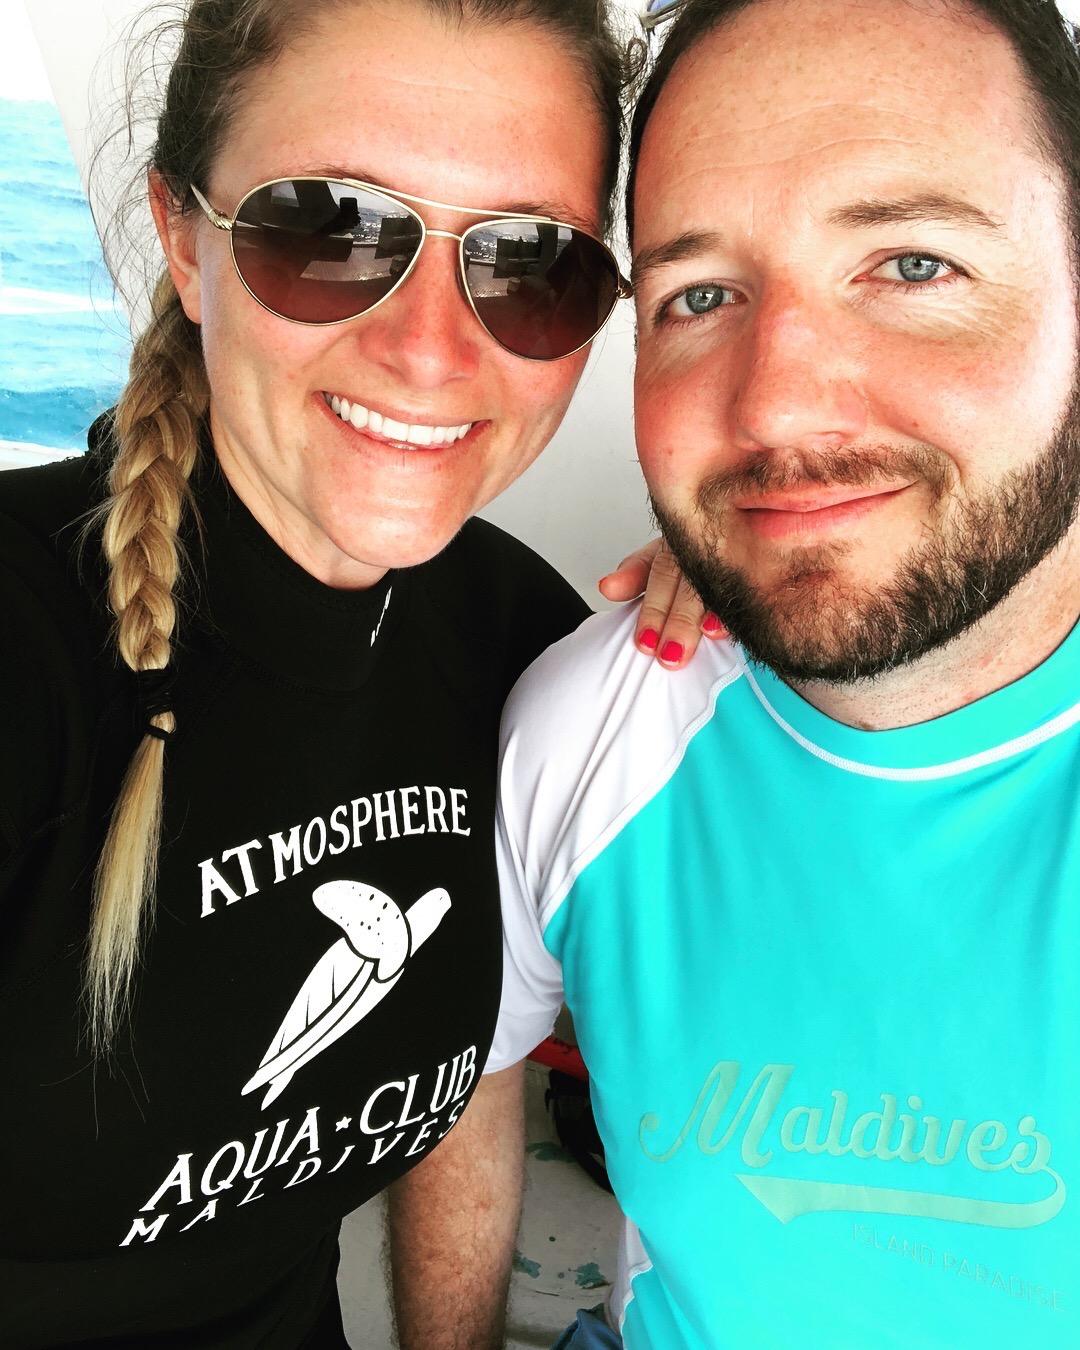 Anais & Patrick Honeymoon  Click to see photos and feedback